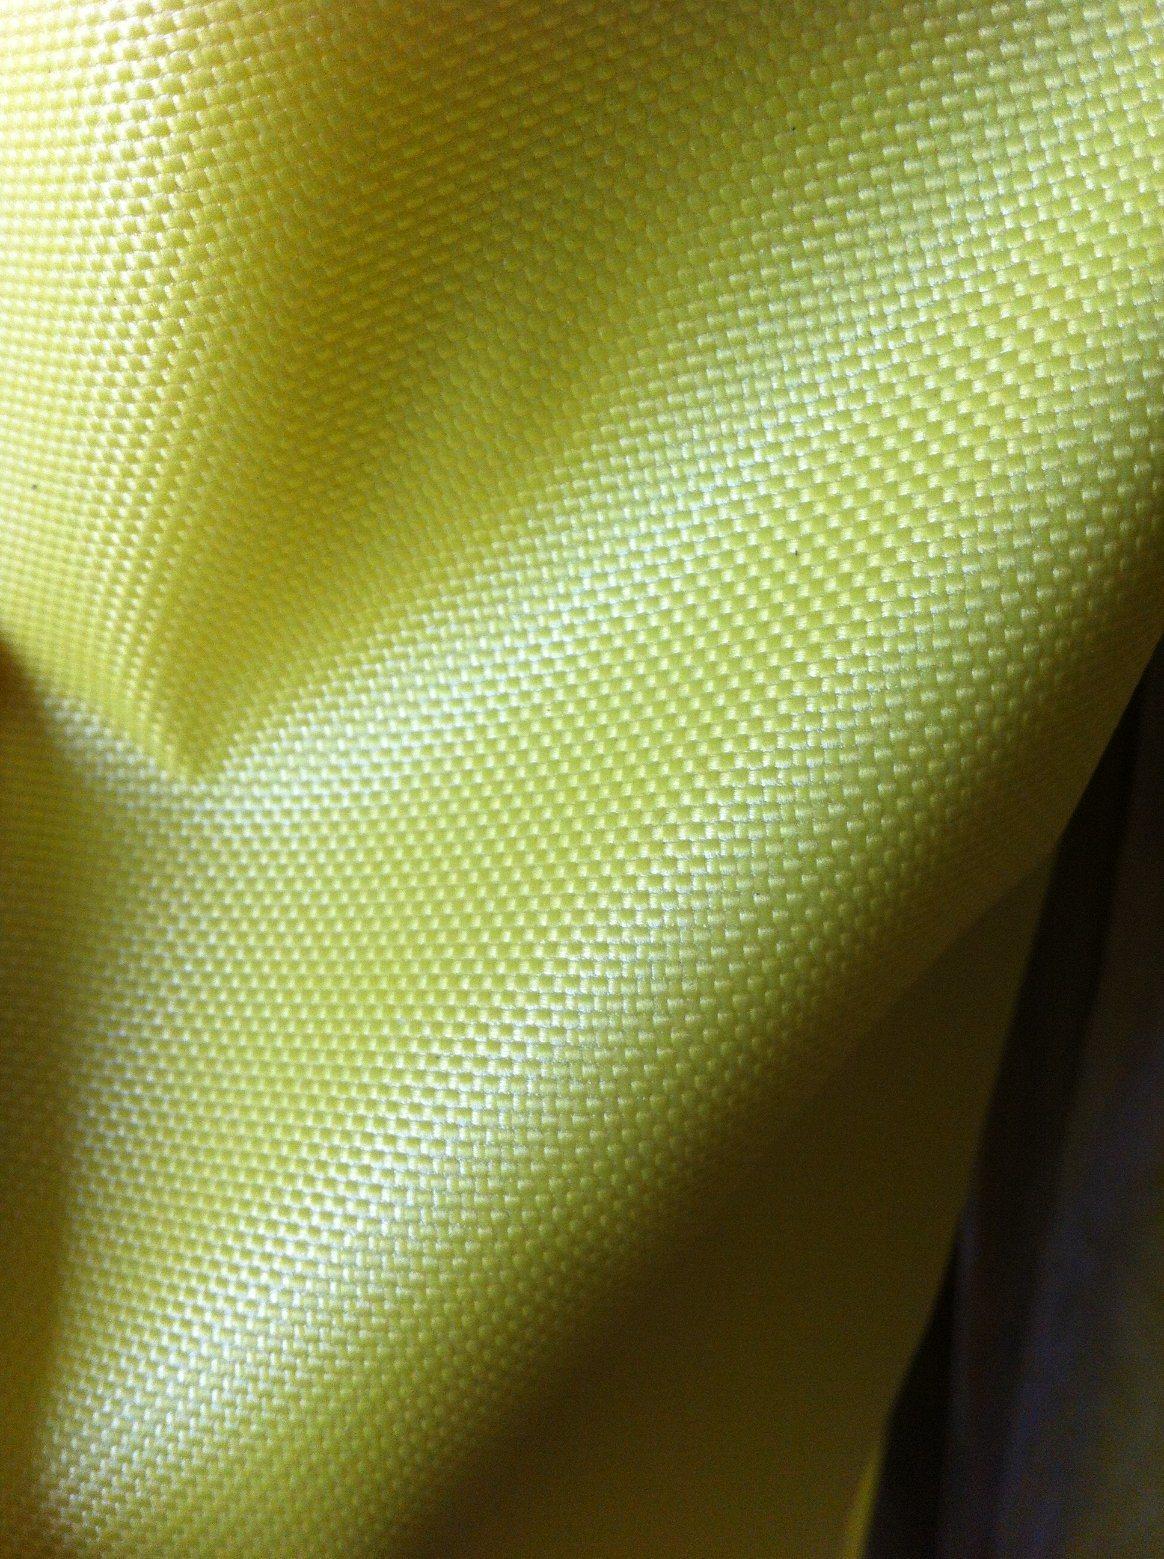 China 100% Nylon Oxford Fabric with PU Coated Waterproof Fabric for Bags and Tent - China Nylon Oxford Fabric Bag Fabric & China 100% Nylon Oxford Fabric with PU Coated Waterproof Fabric ...